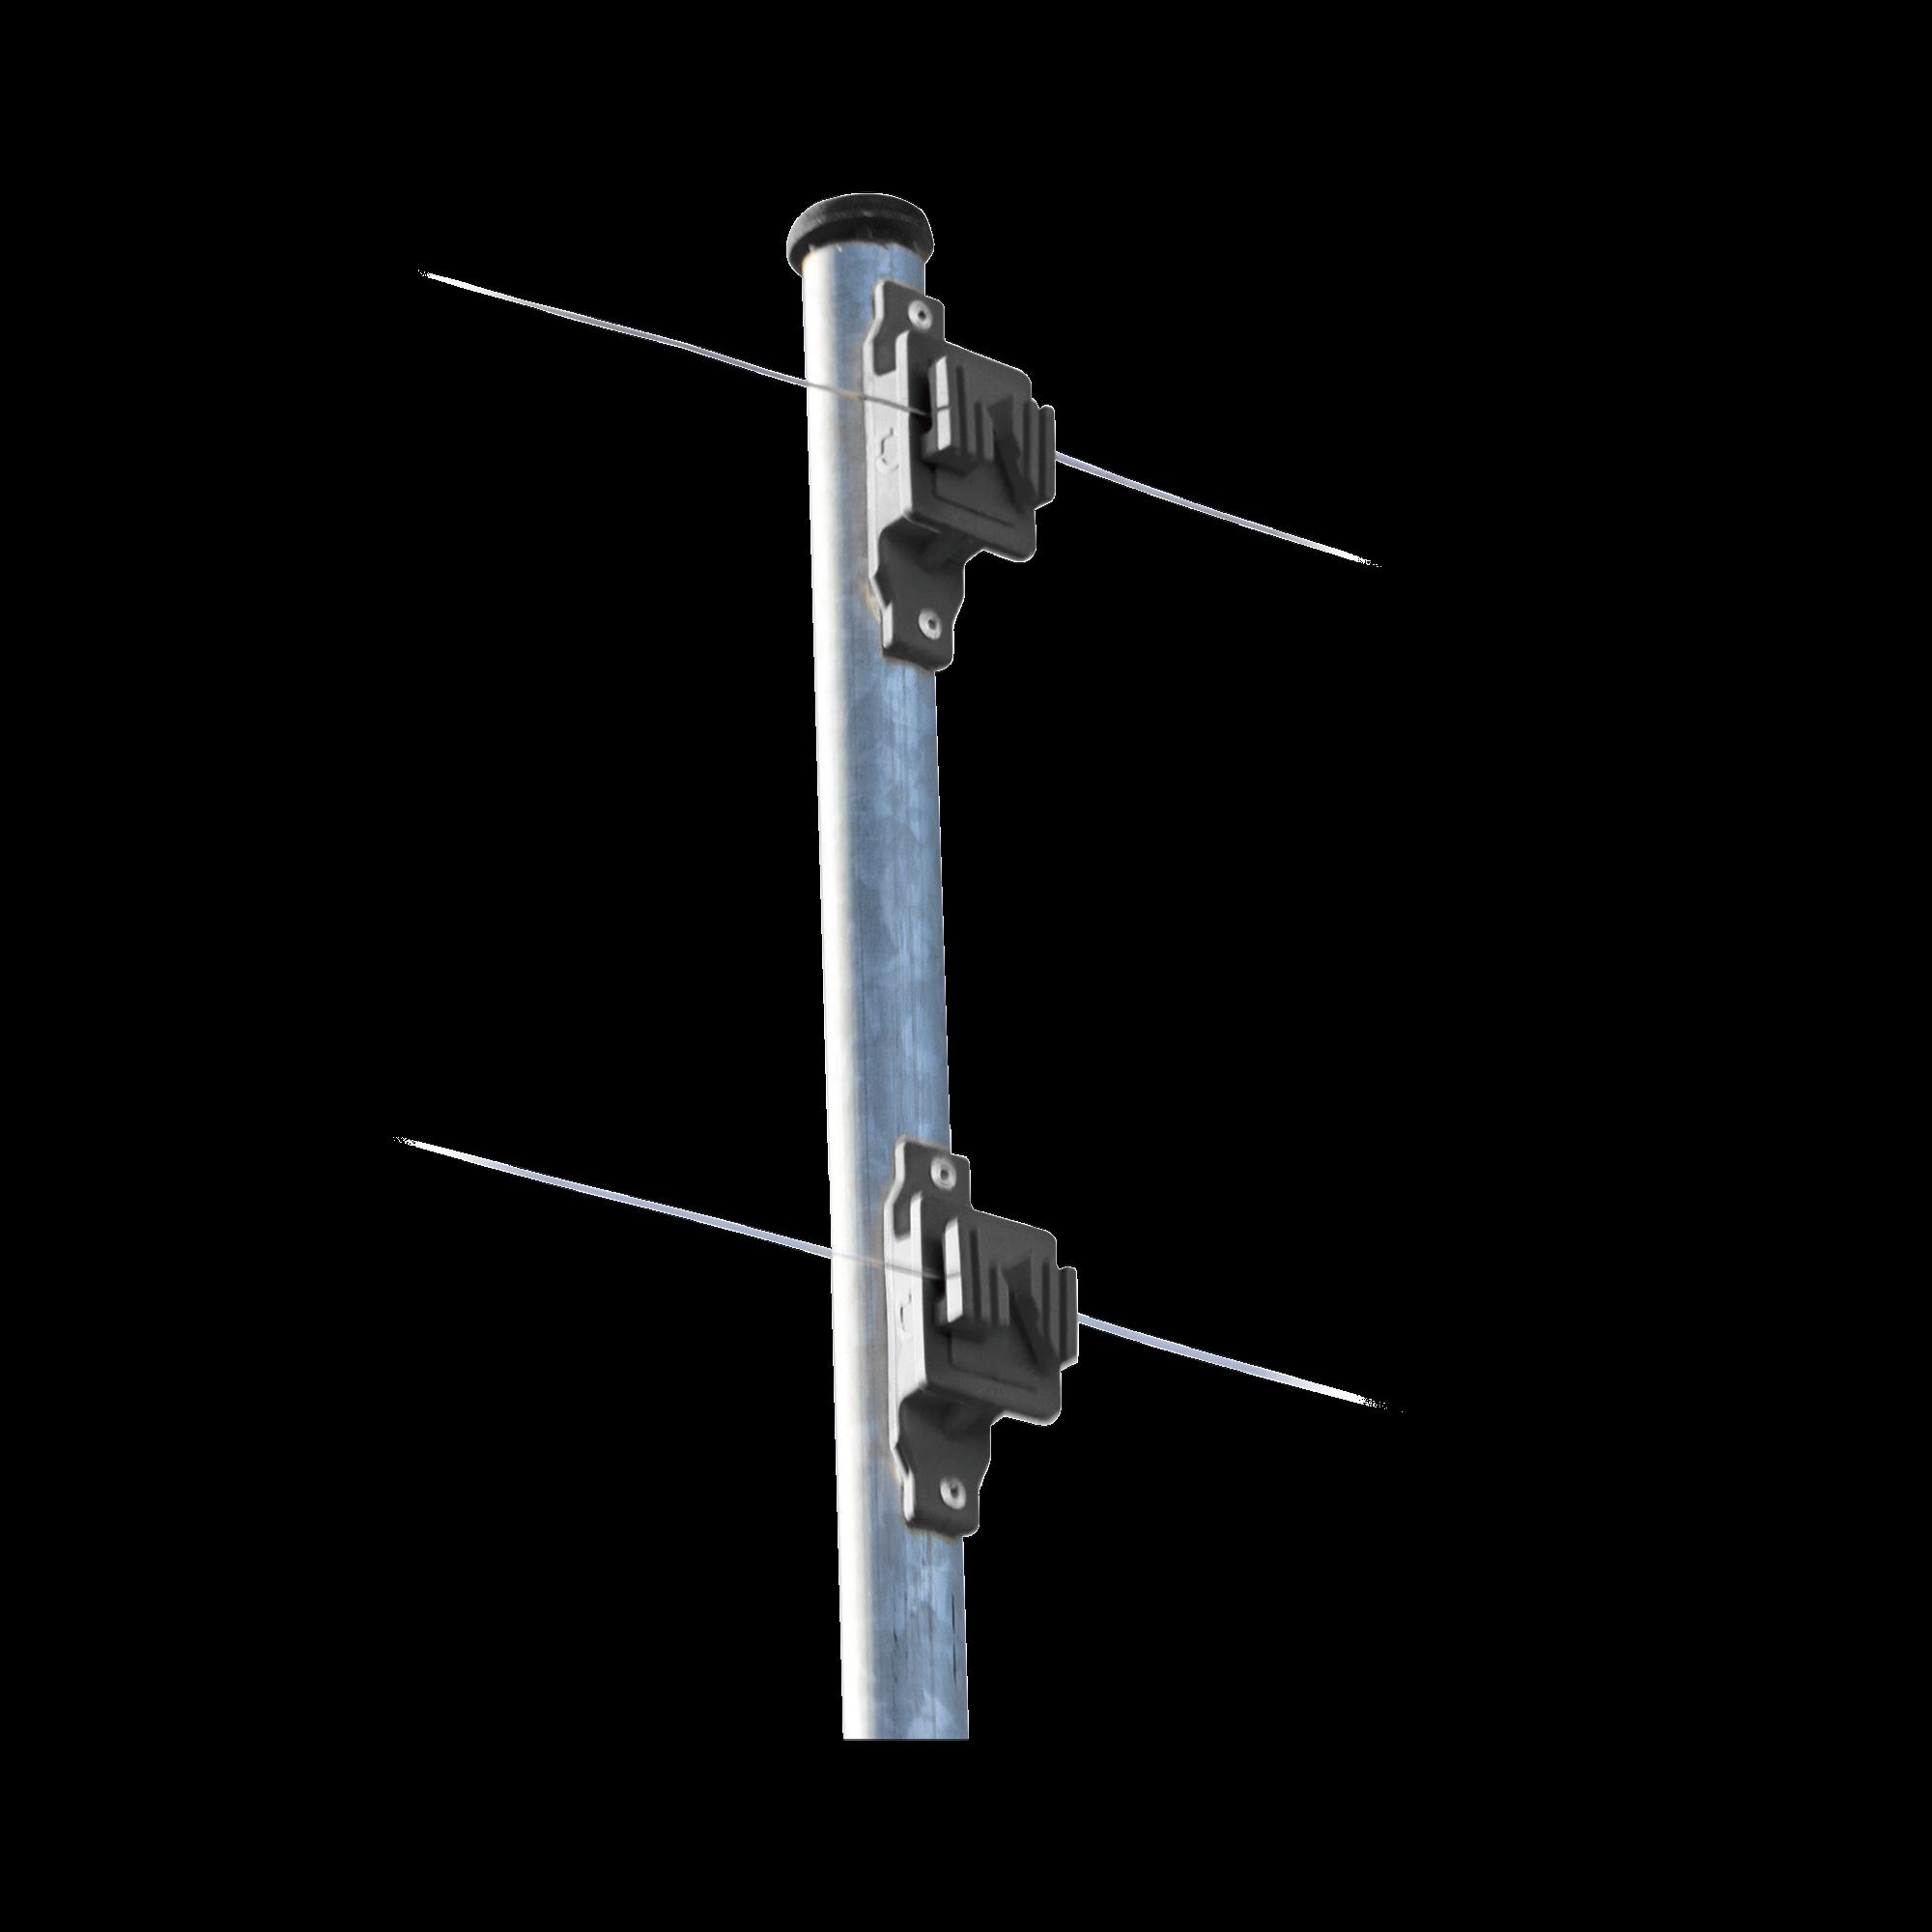 Aislador de Paso reforzado para cercos eléctricos, resistente al clima extremoso